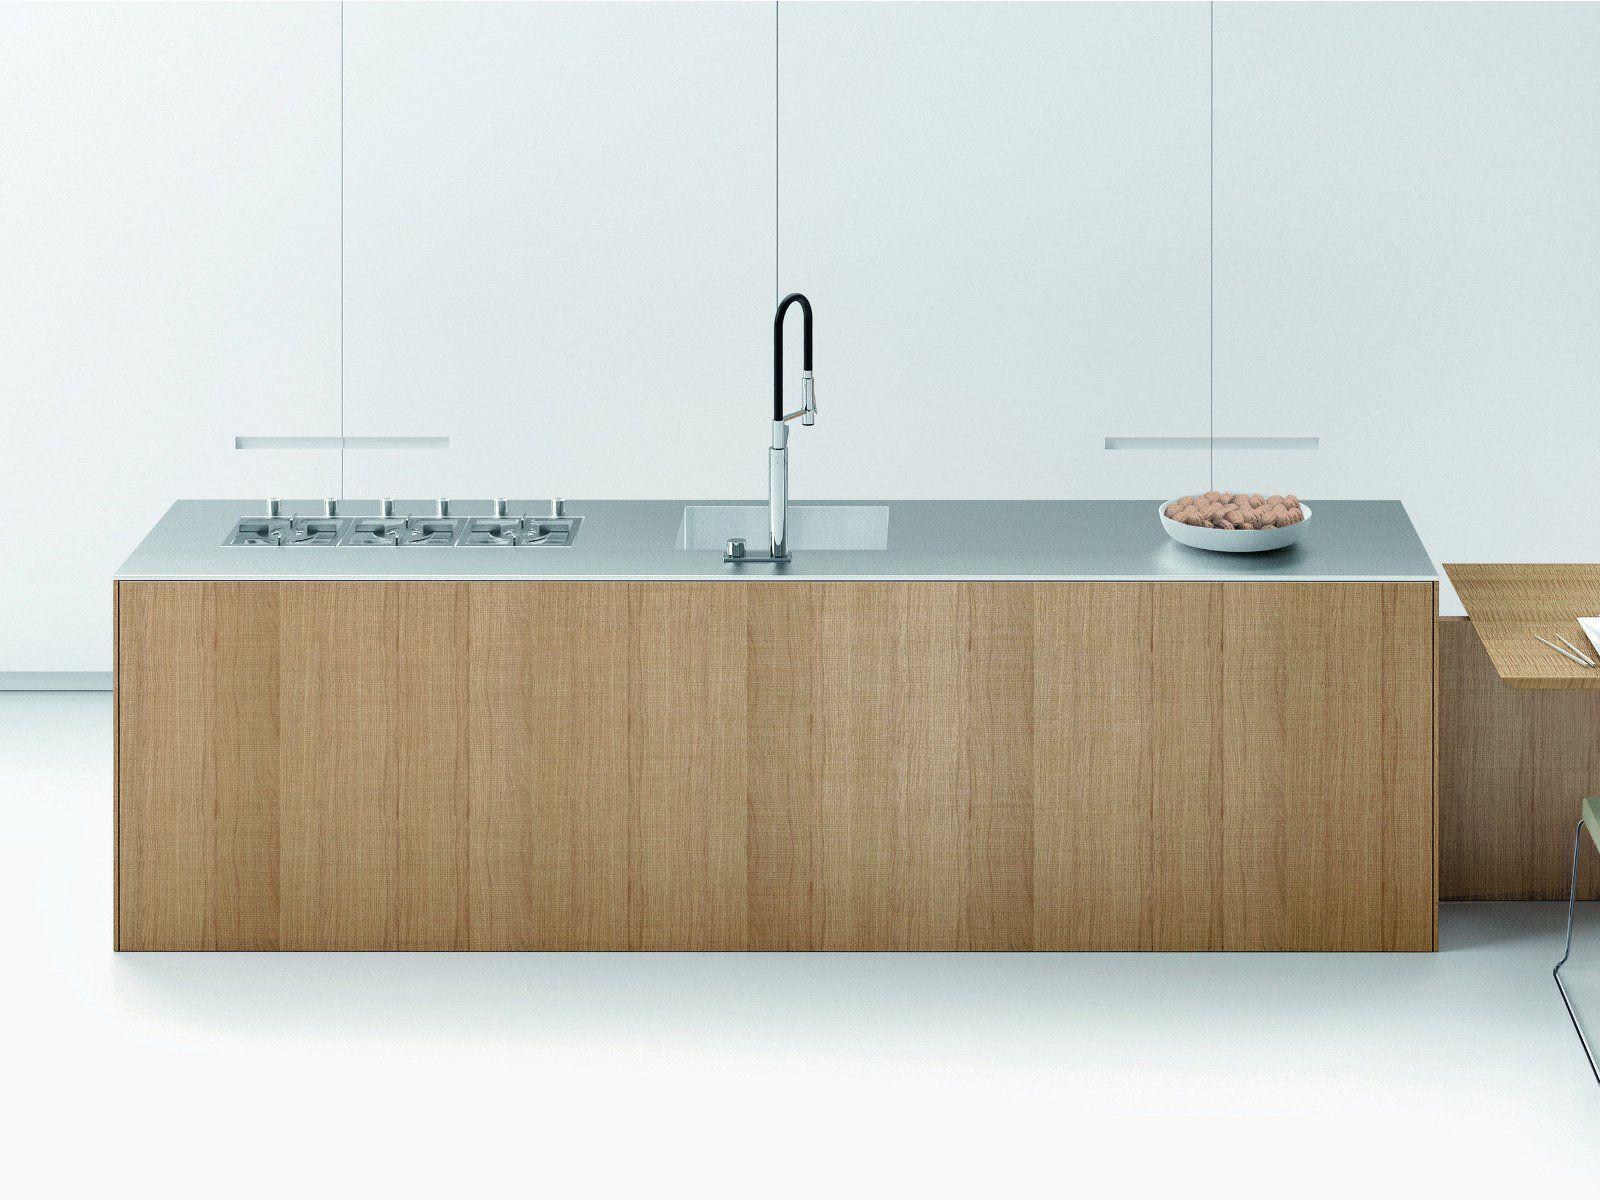 antis kitchen furniture euromobil design euromobil. Wooden Fitted Kitchen FILO ANTIS ASSIM Assim Collection By Euromobil | Design Roberto Gobbo Antis Furniture S